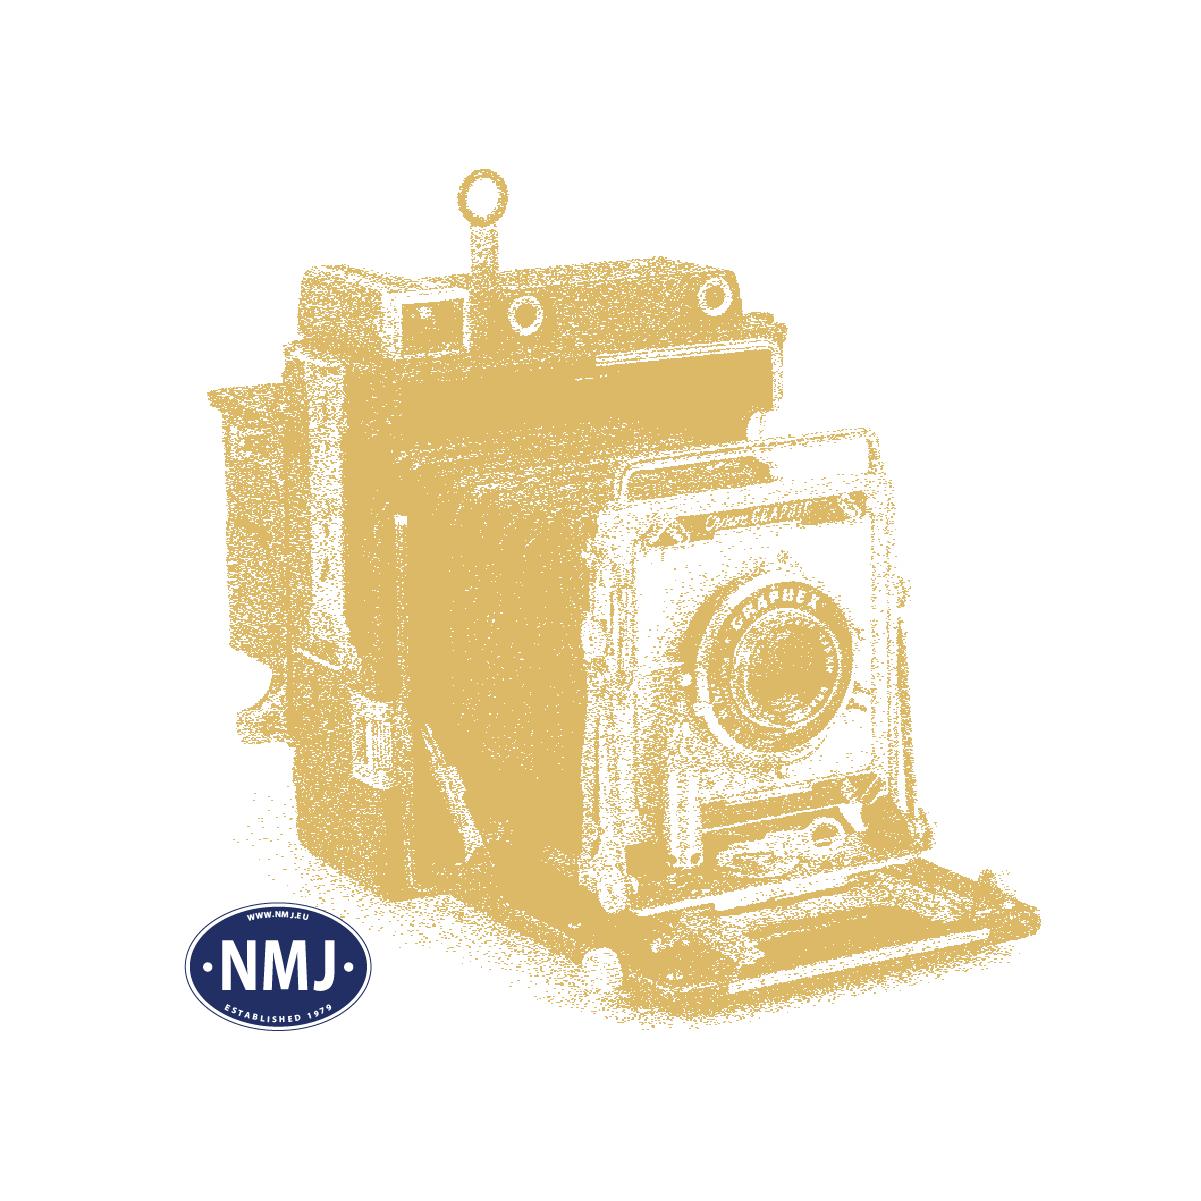 "NMJT90006 - NMJ Topline NSB Di3a.608 ""Nohab"", DCC Sound"